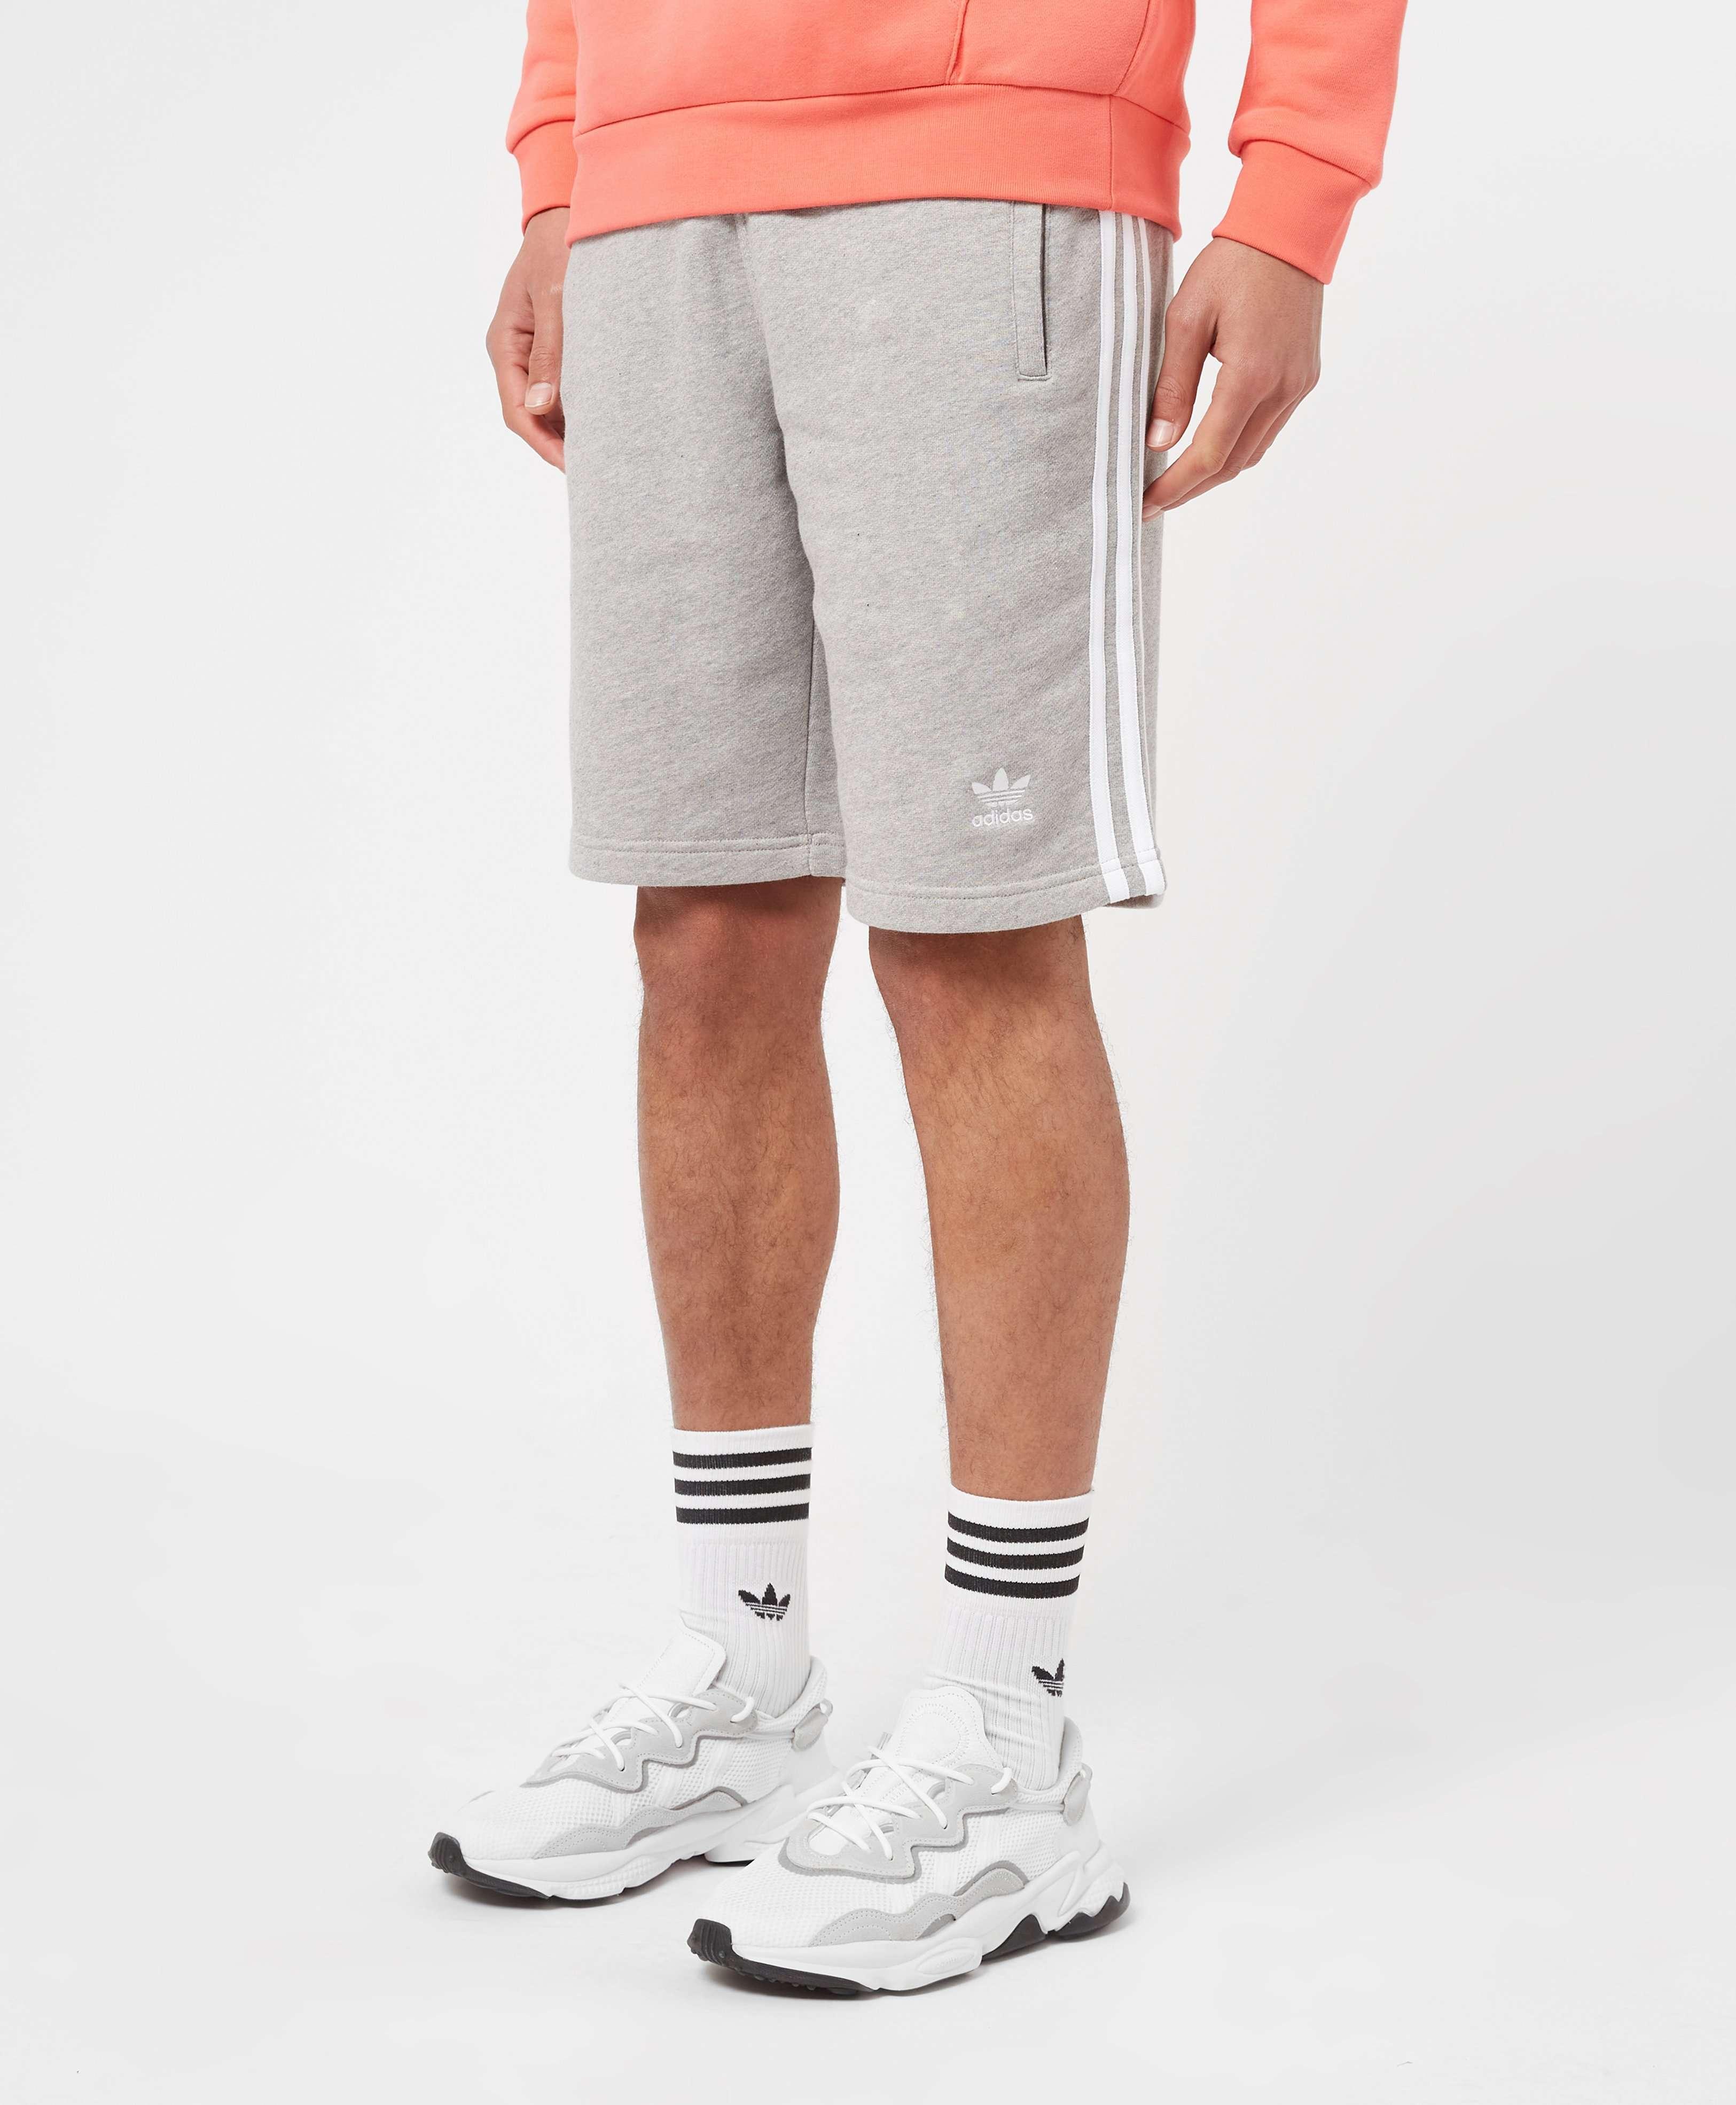 adidas Originals 3-Stripes Fleece Shorts